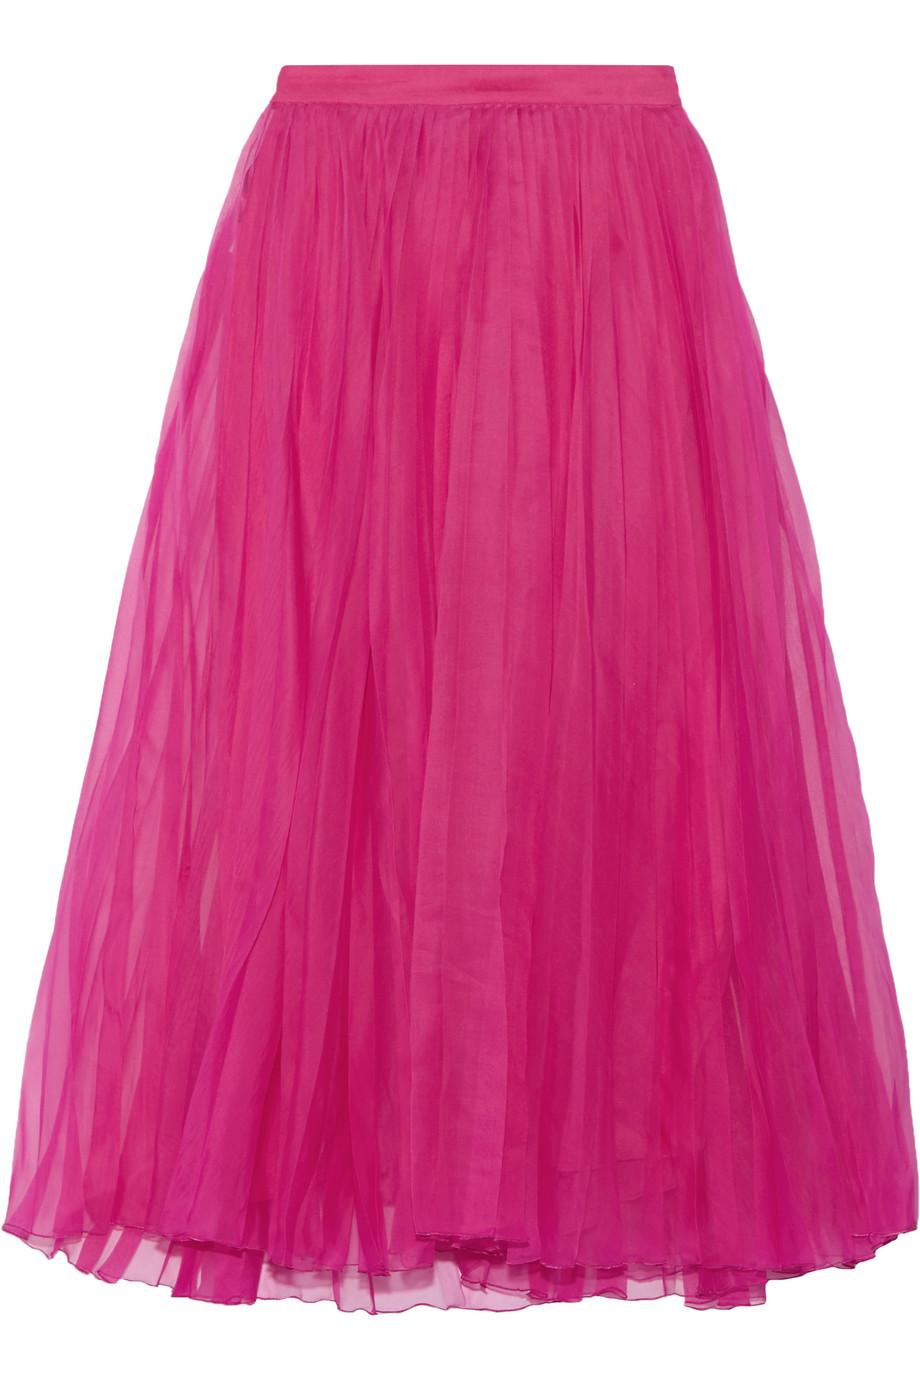 Gucci Pleated Silk-Blend Organza Midi Skirt, Fuchsia, Women's, Size: 38